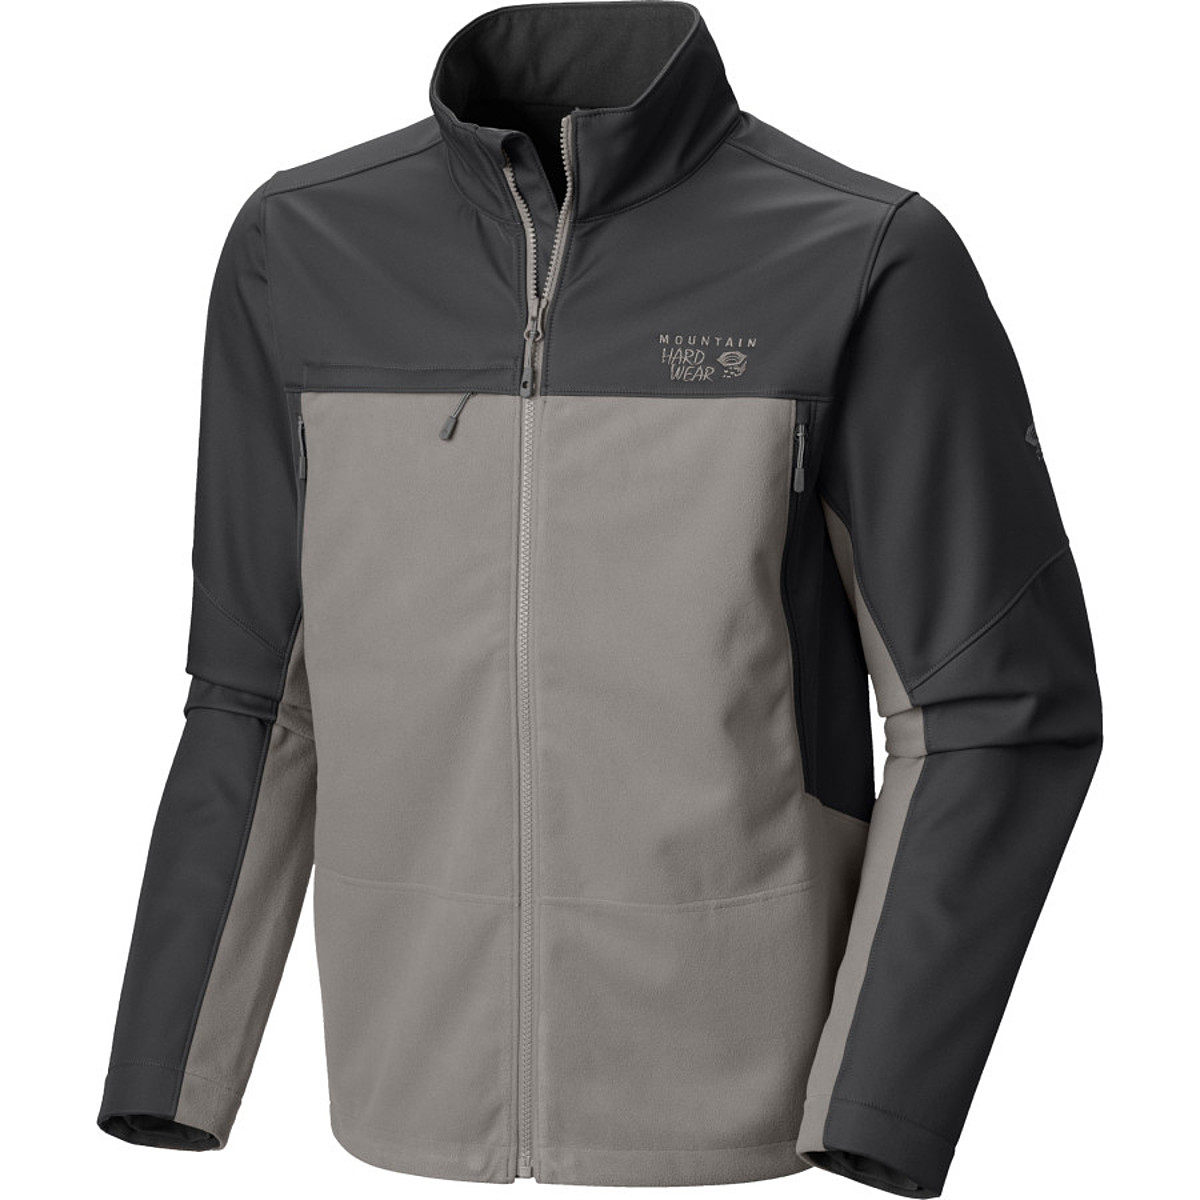 Mountain Hardwear Mountain Tech II Jacket